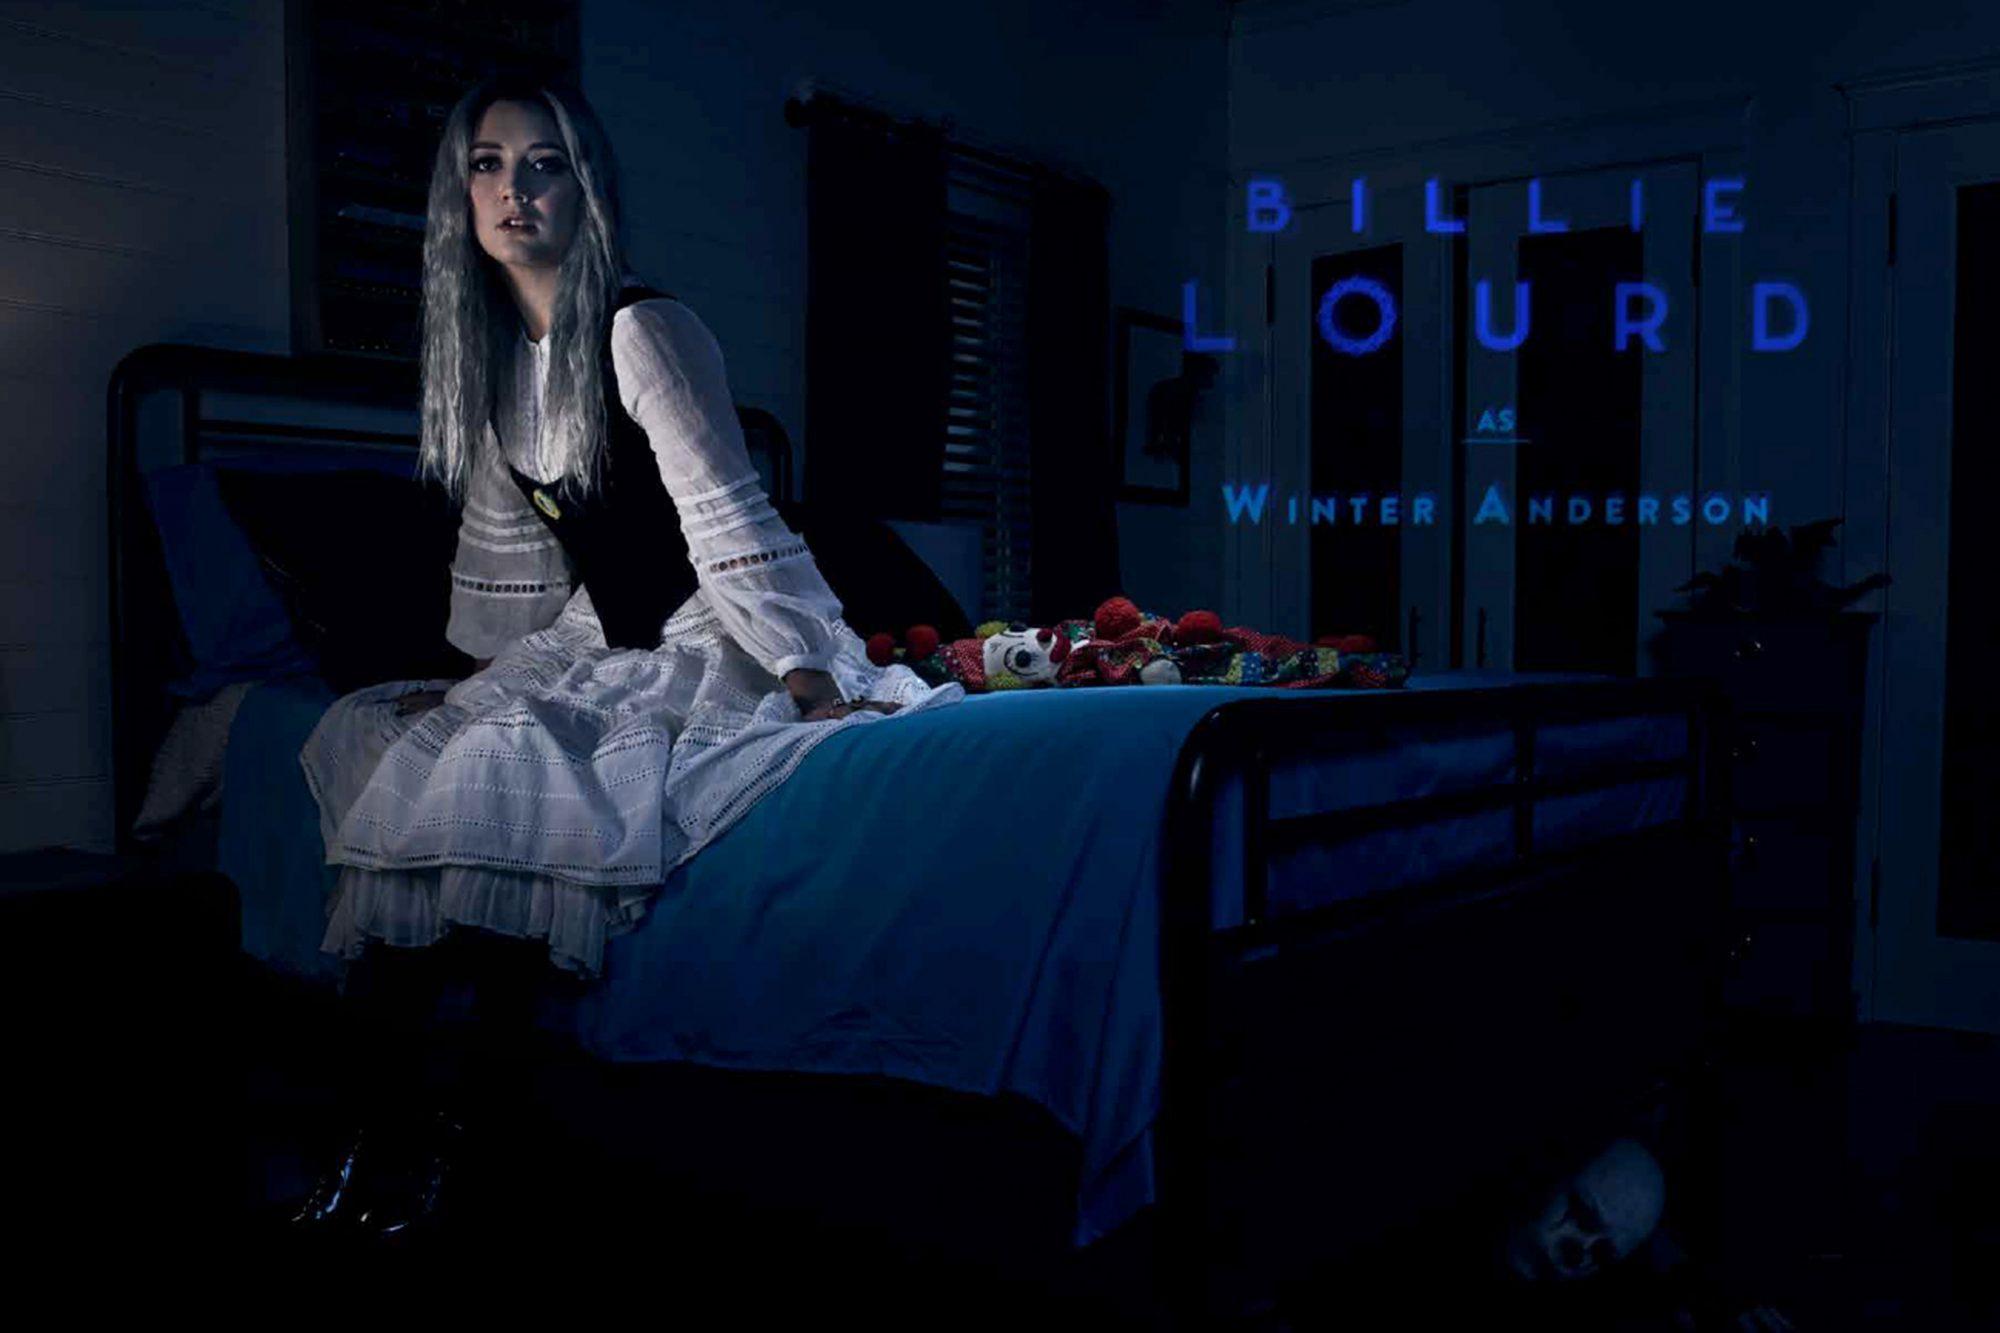 American Horror Story Cult - Billie Lourd